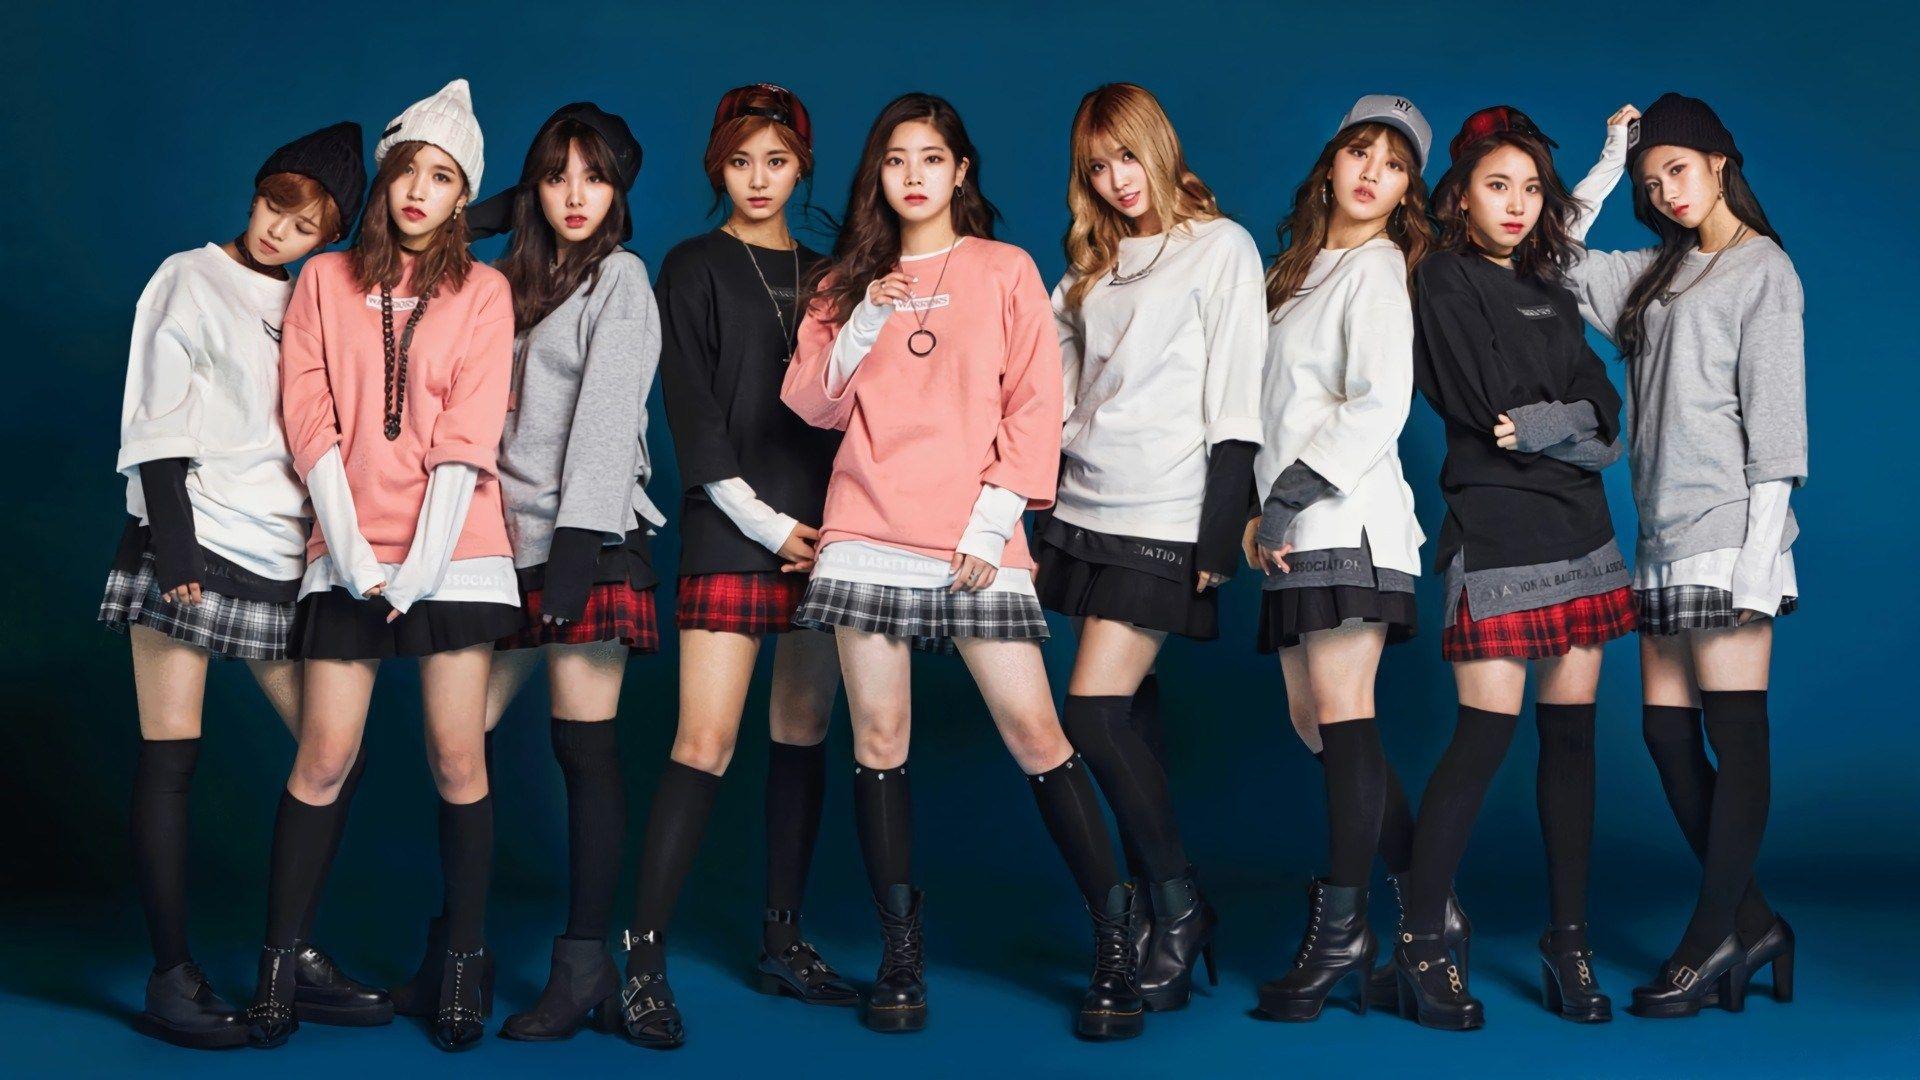 Twice Wallpaper Computer Desktop Kpop Girls Nba Fashion Twice Photoshoot